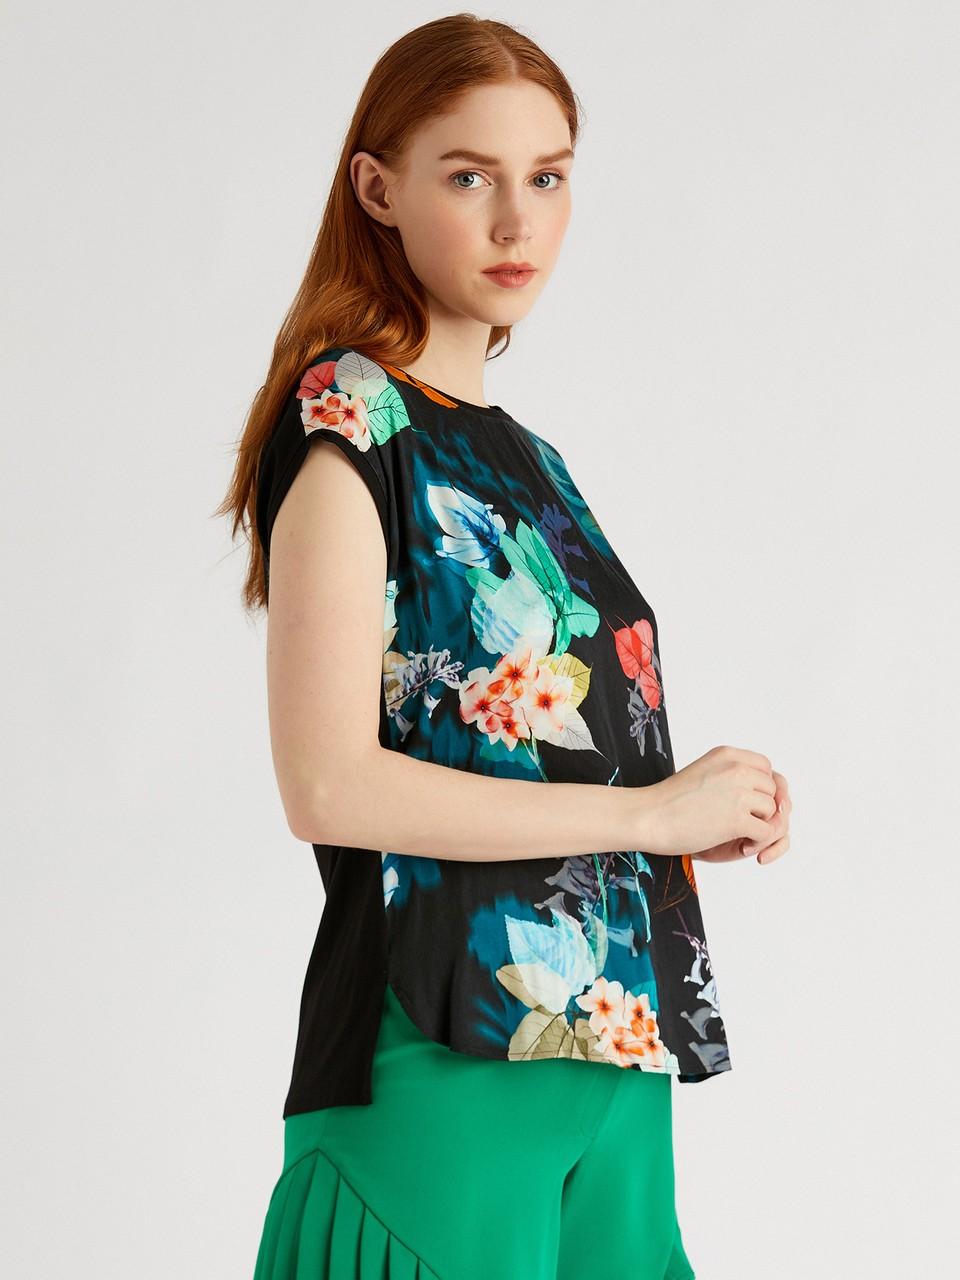 Floral Patterned Blouse